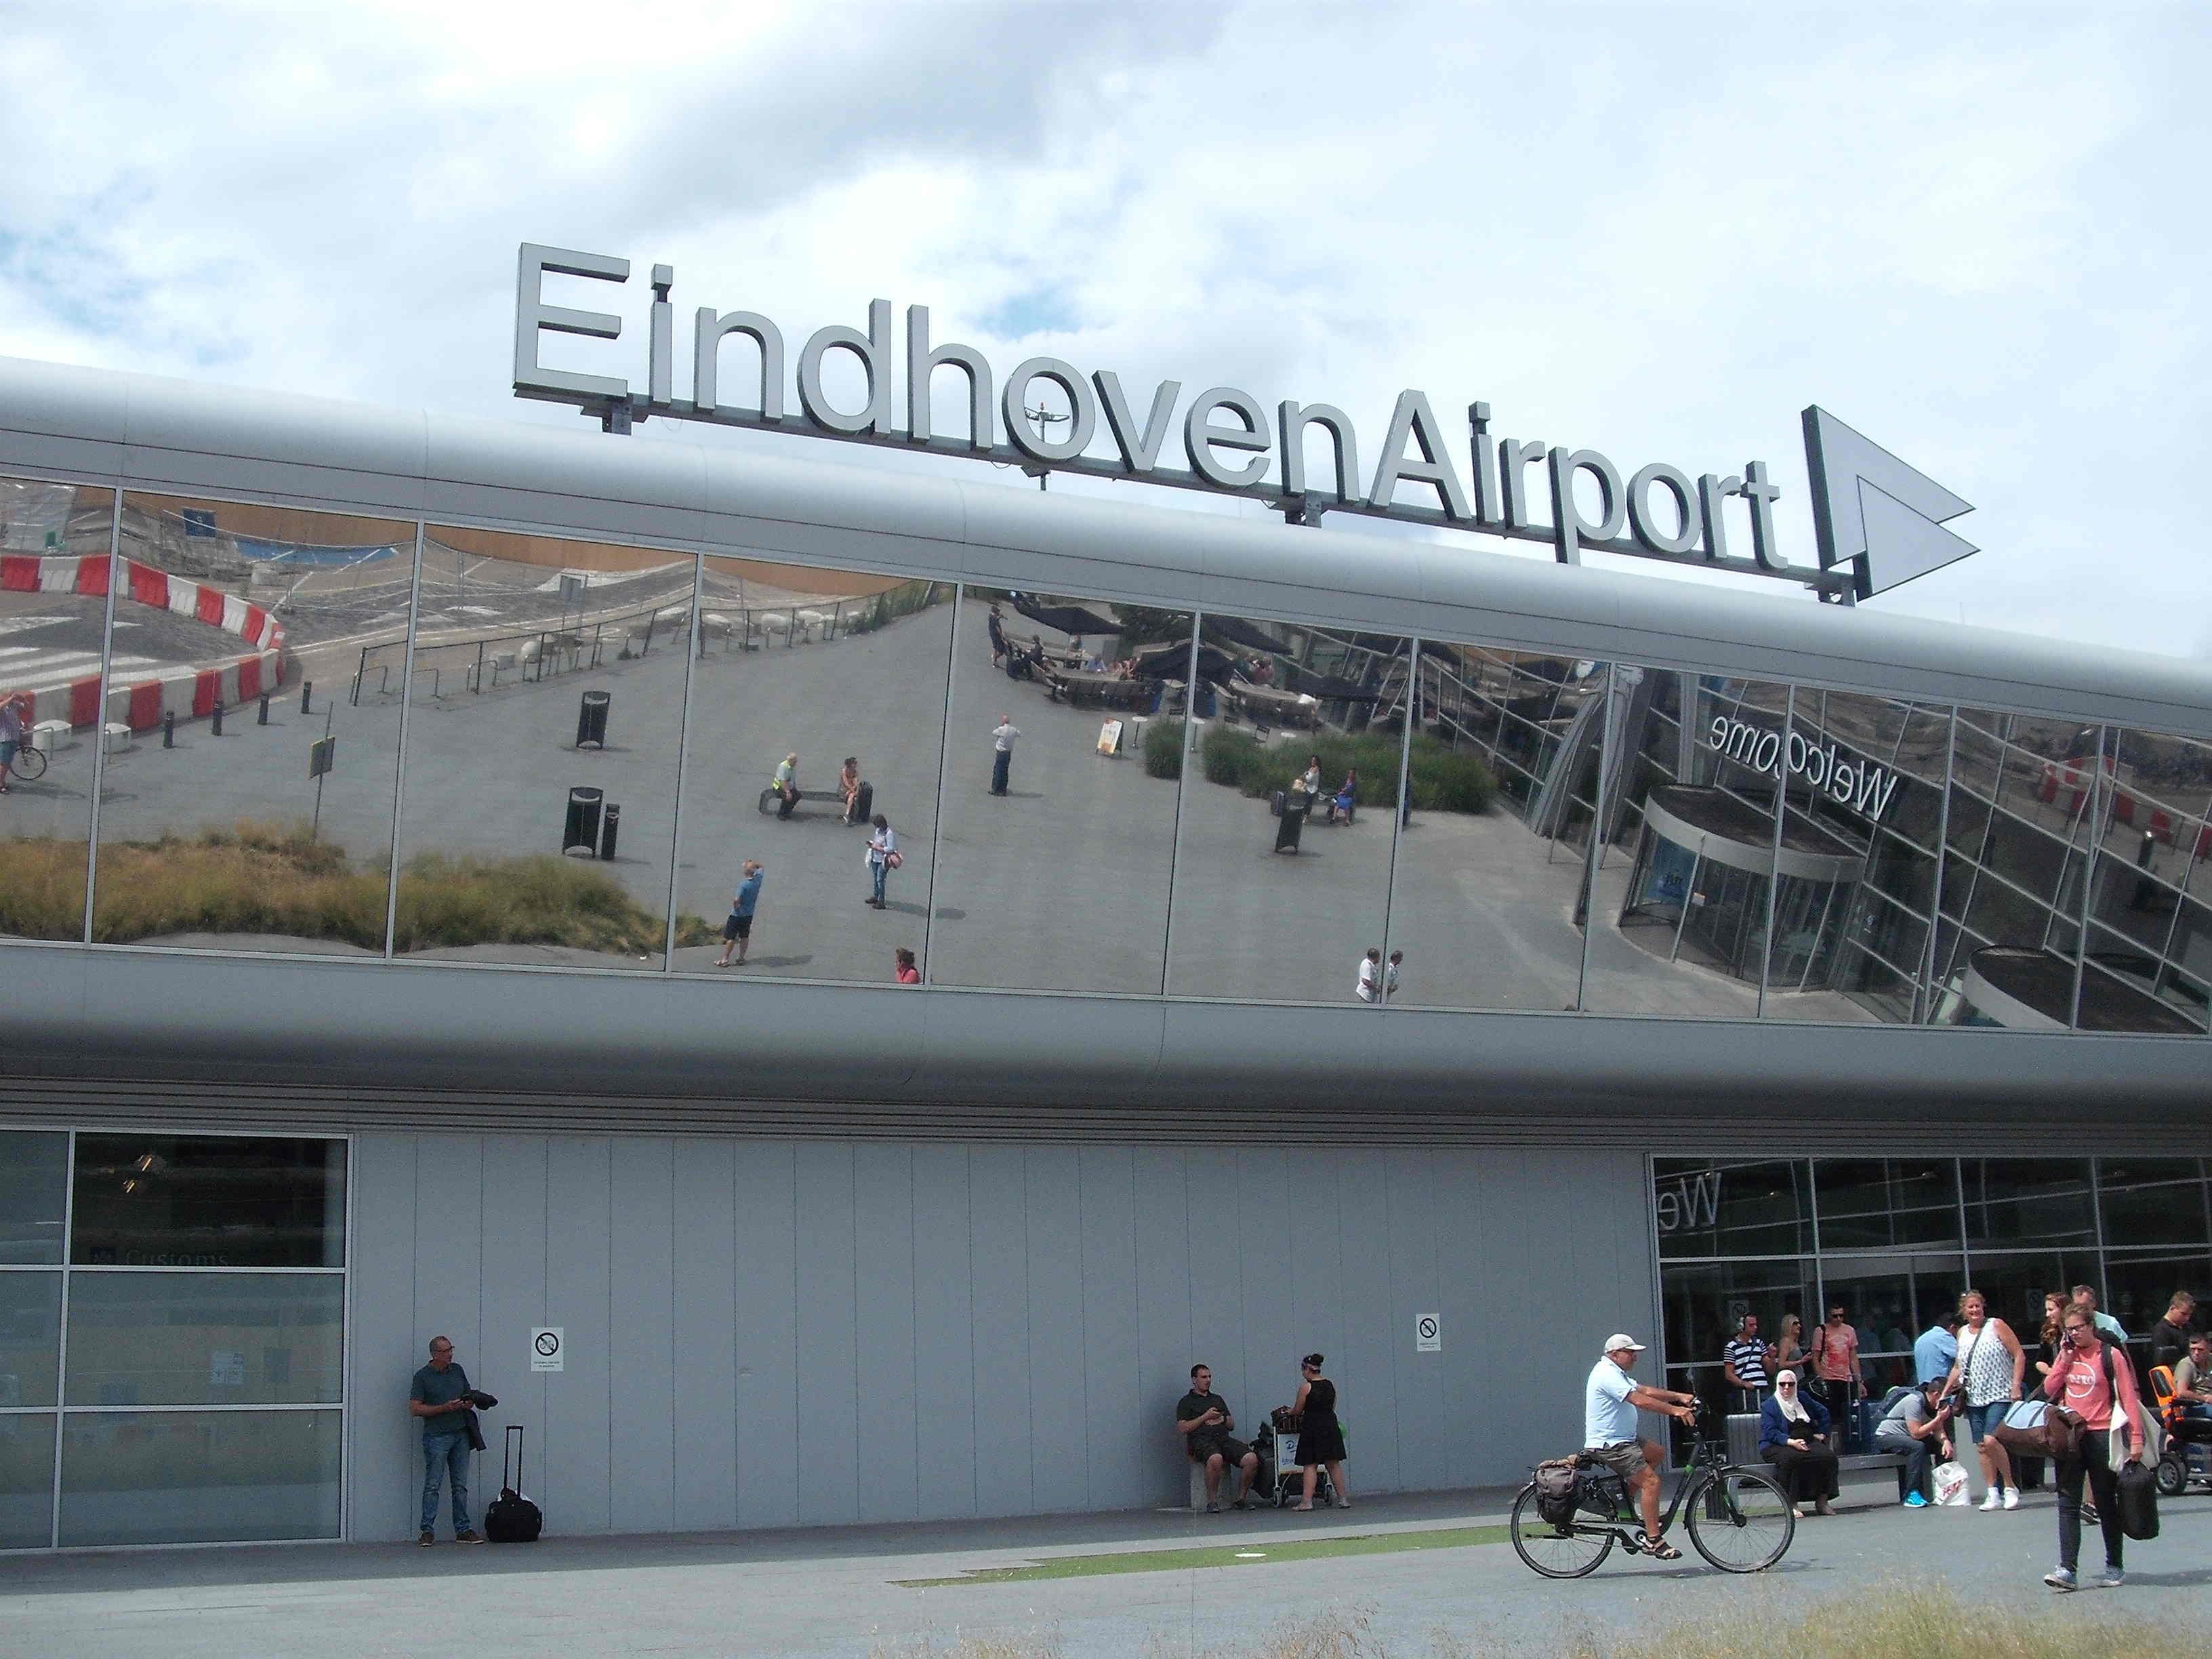 SP stelt Statenvragen over opvatting VNO-NCW voorman over Eindhoven Airport